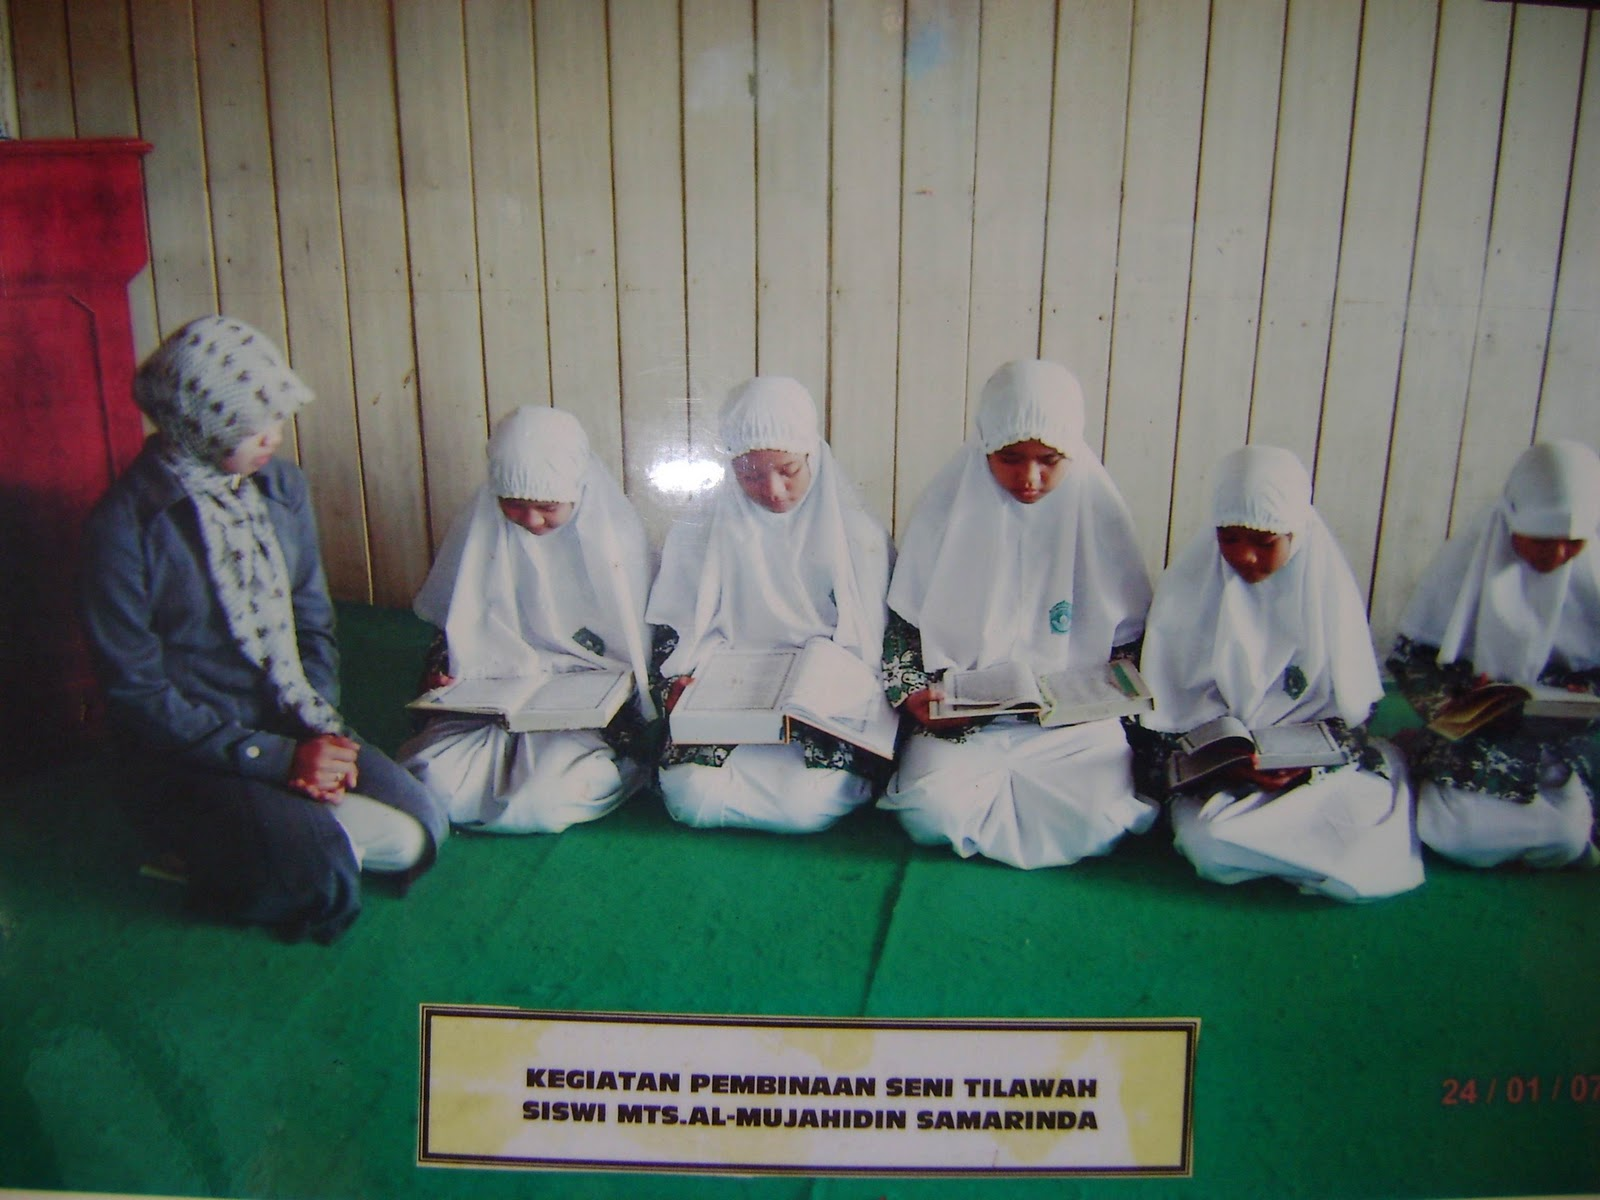 Mts al mujahidin samarinda terakreditasi baik ( b )